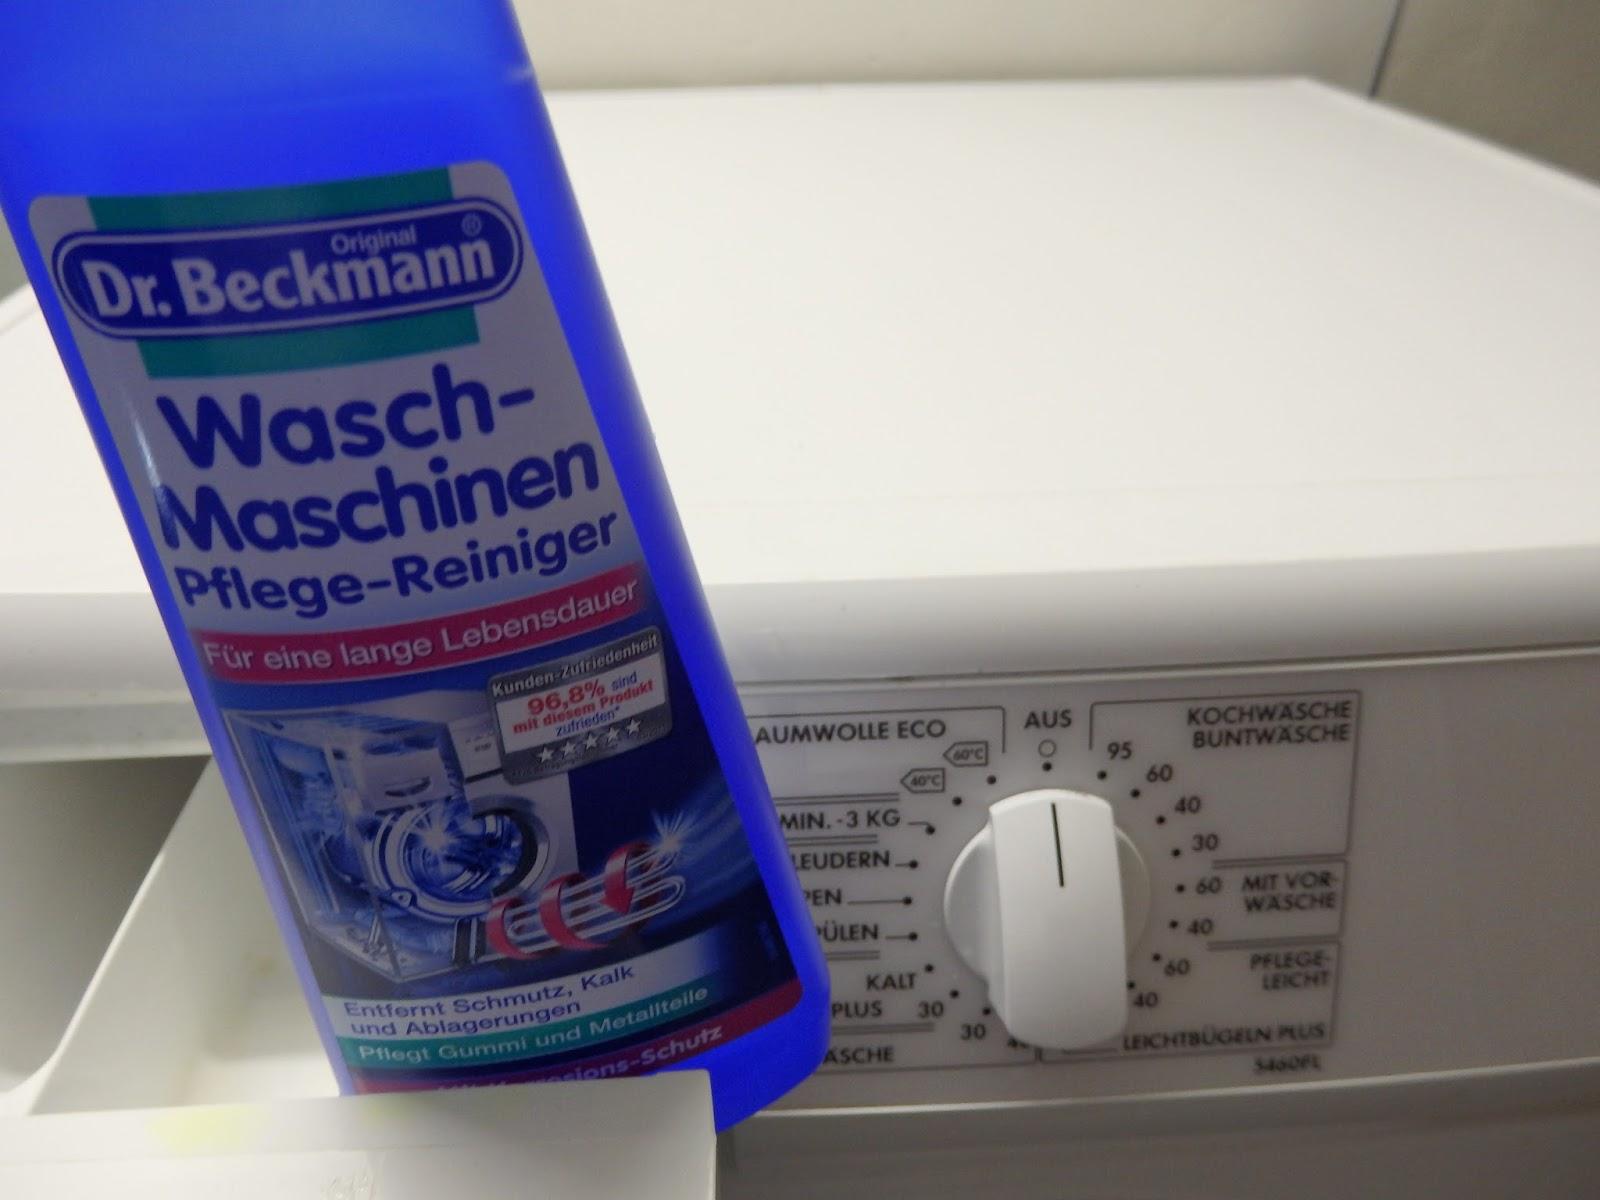 dr beckmann wasch maschinen pflege reiniger. Black Bedroom Furniture Sets. Home Design Ideas